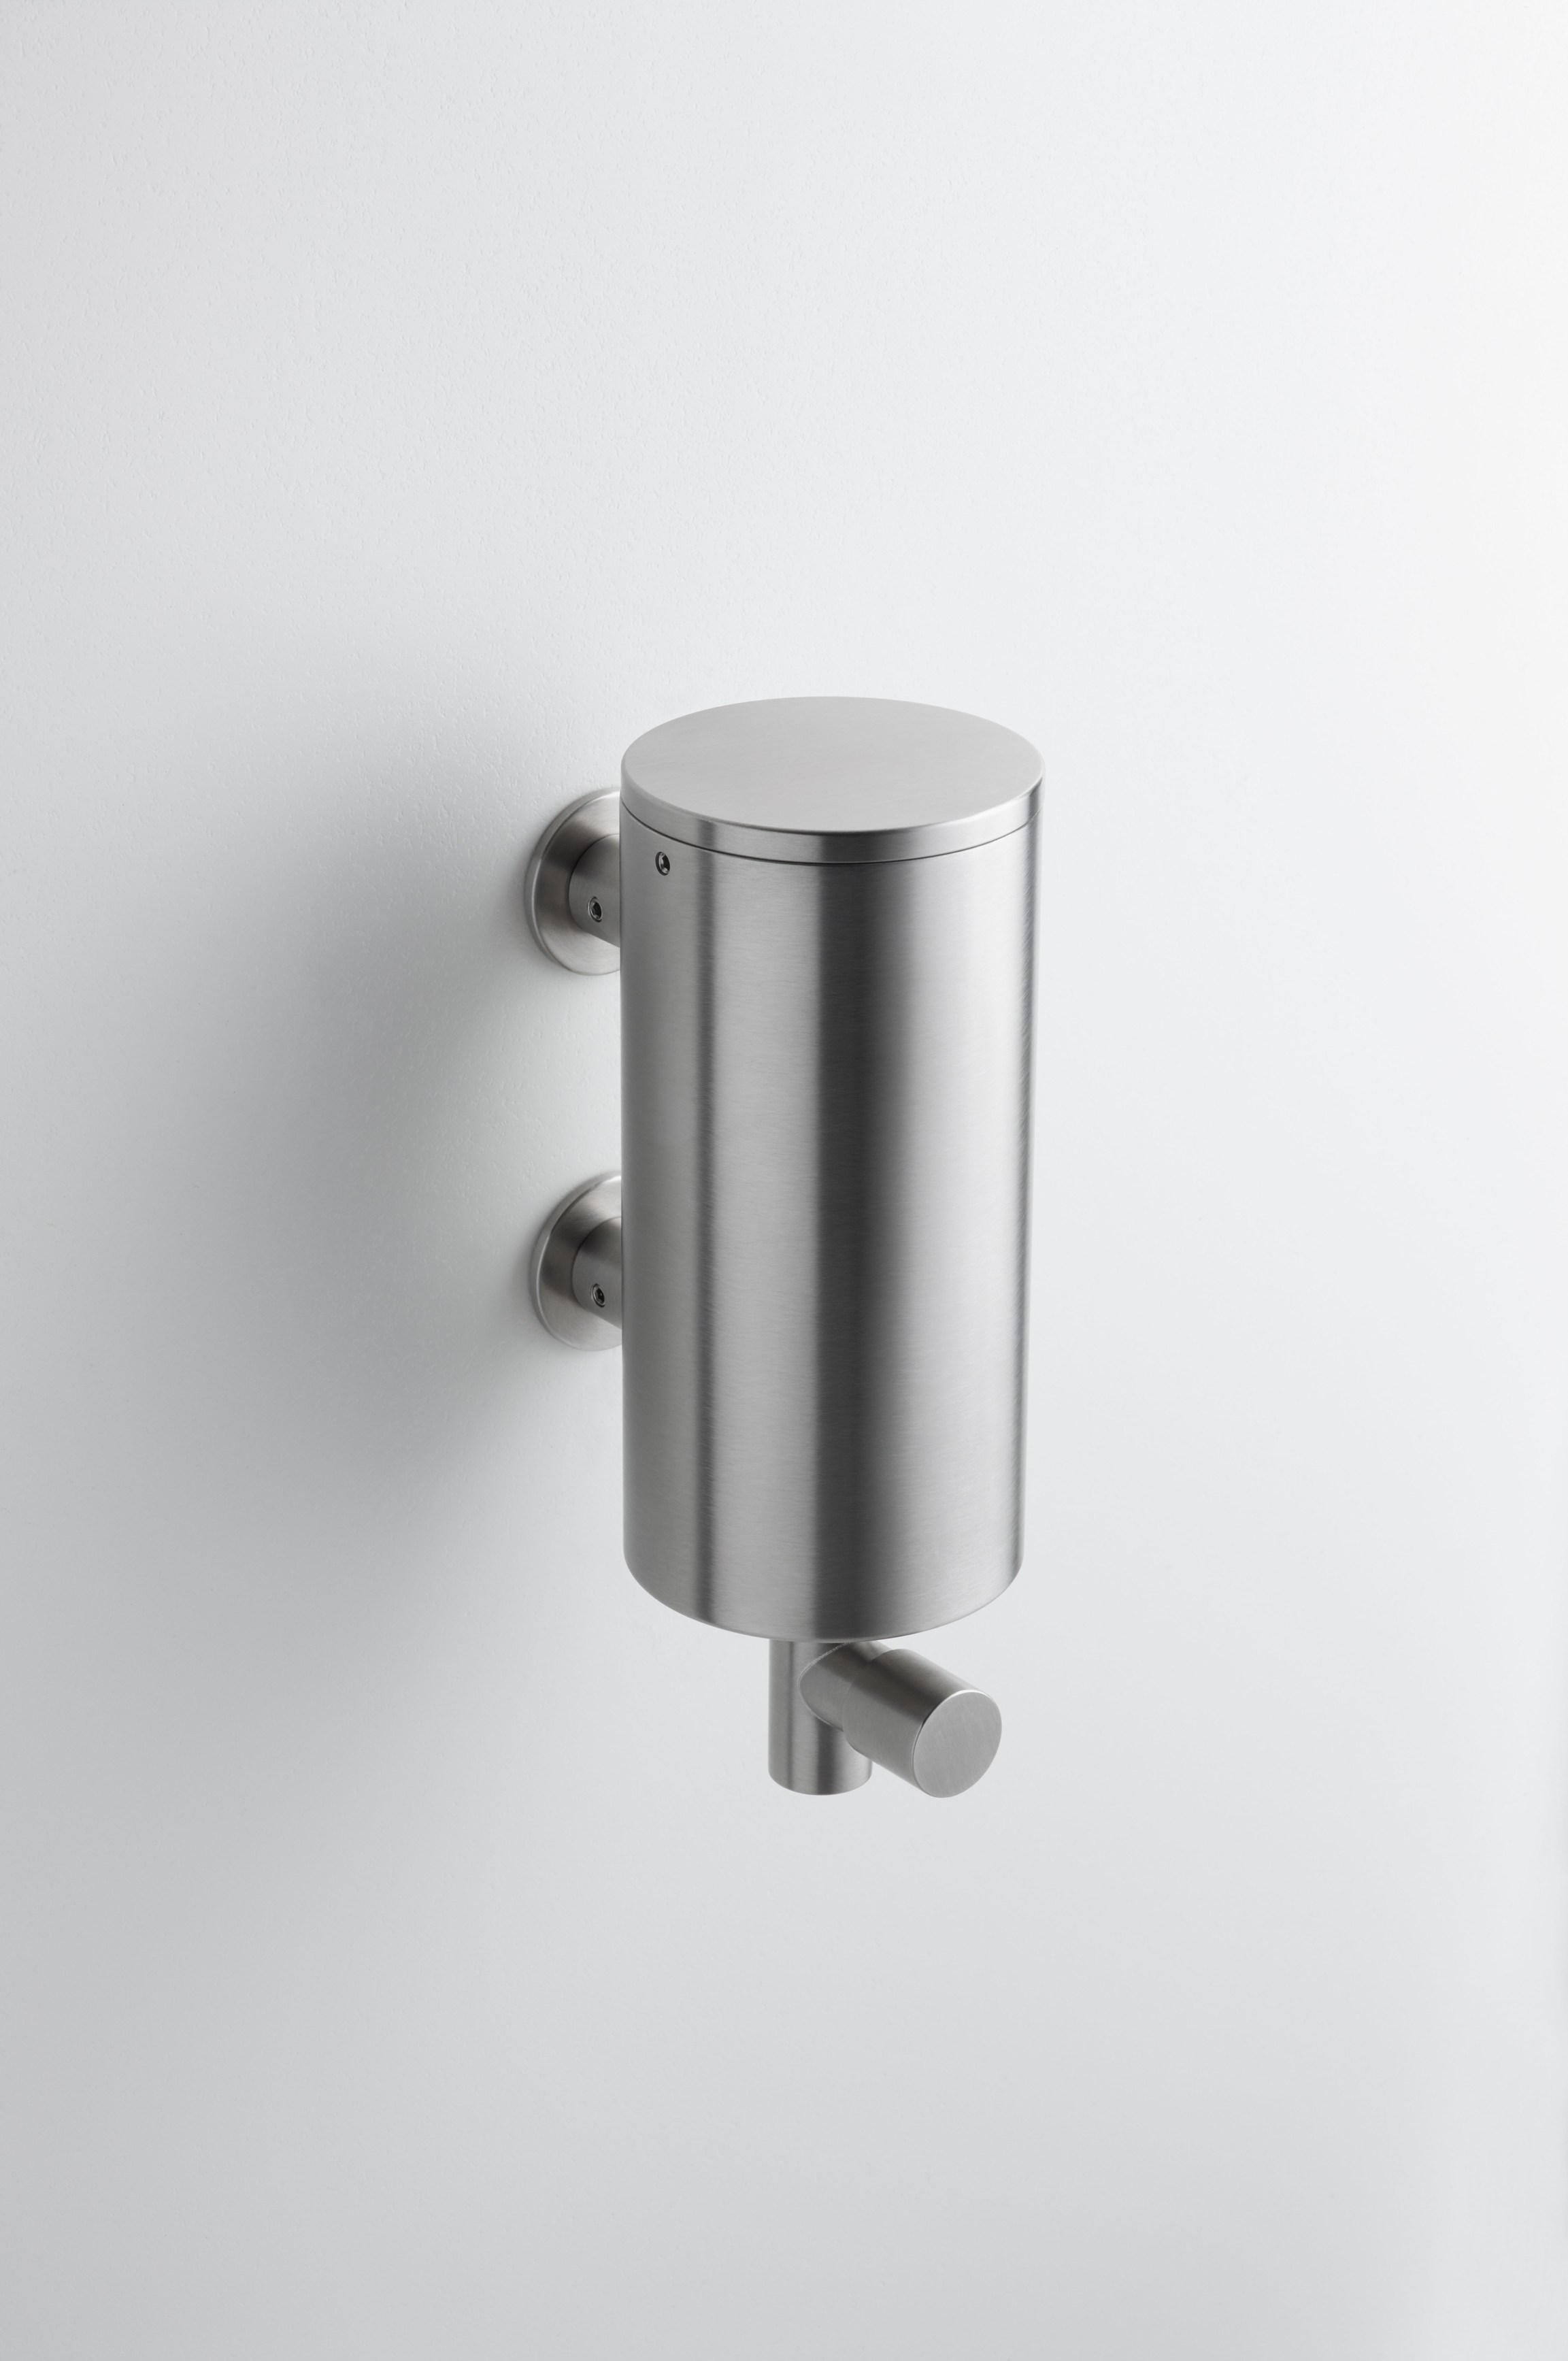 T10 Liquid Soap Dispenser By Vola